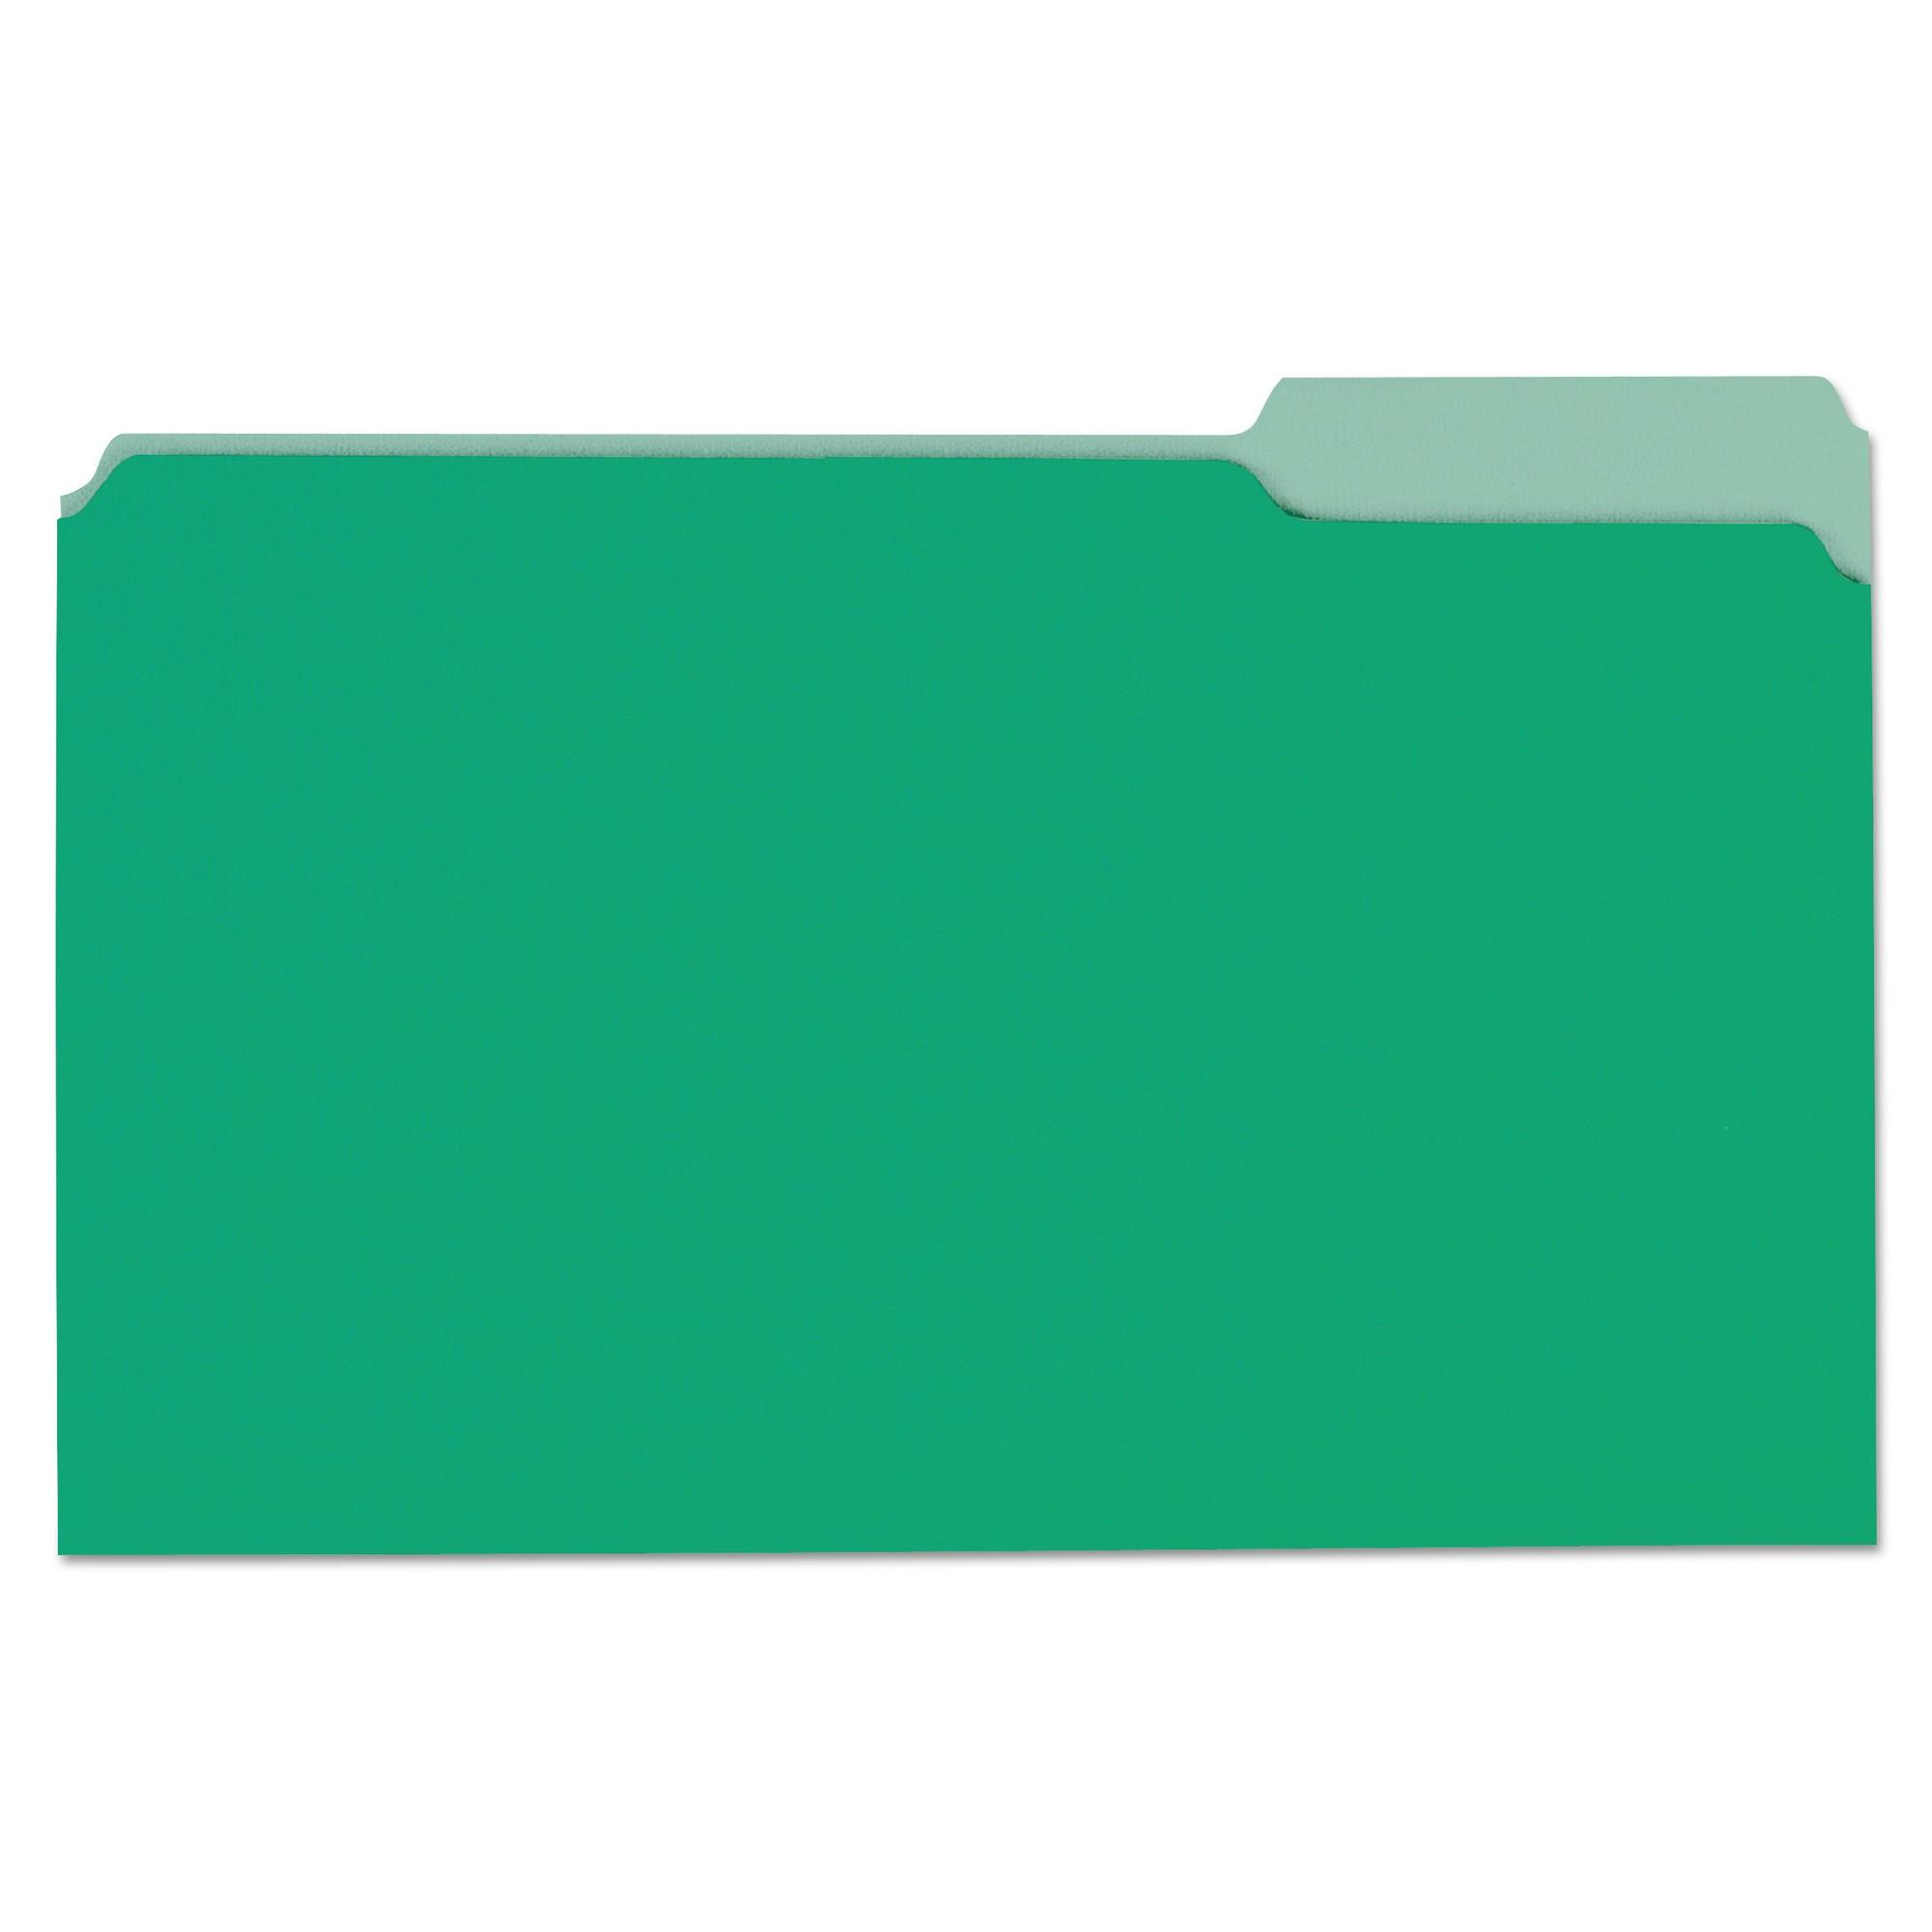 File Folders, 1/3 Cut One-Ply Tab, Legal, Bright Green/Light Green, 100/Box